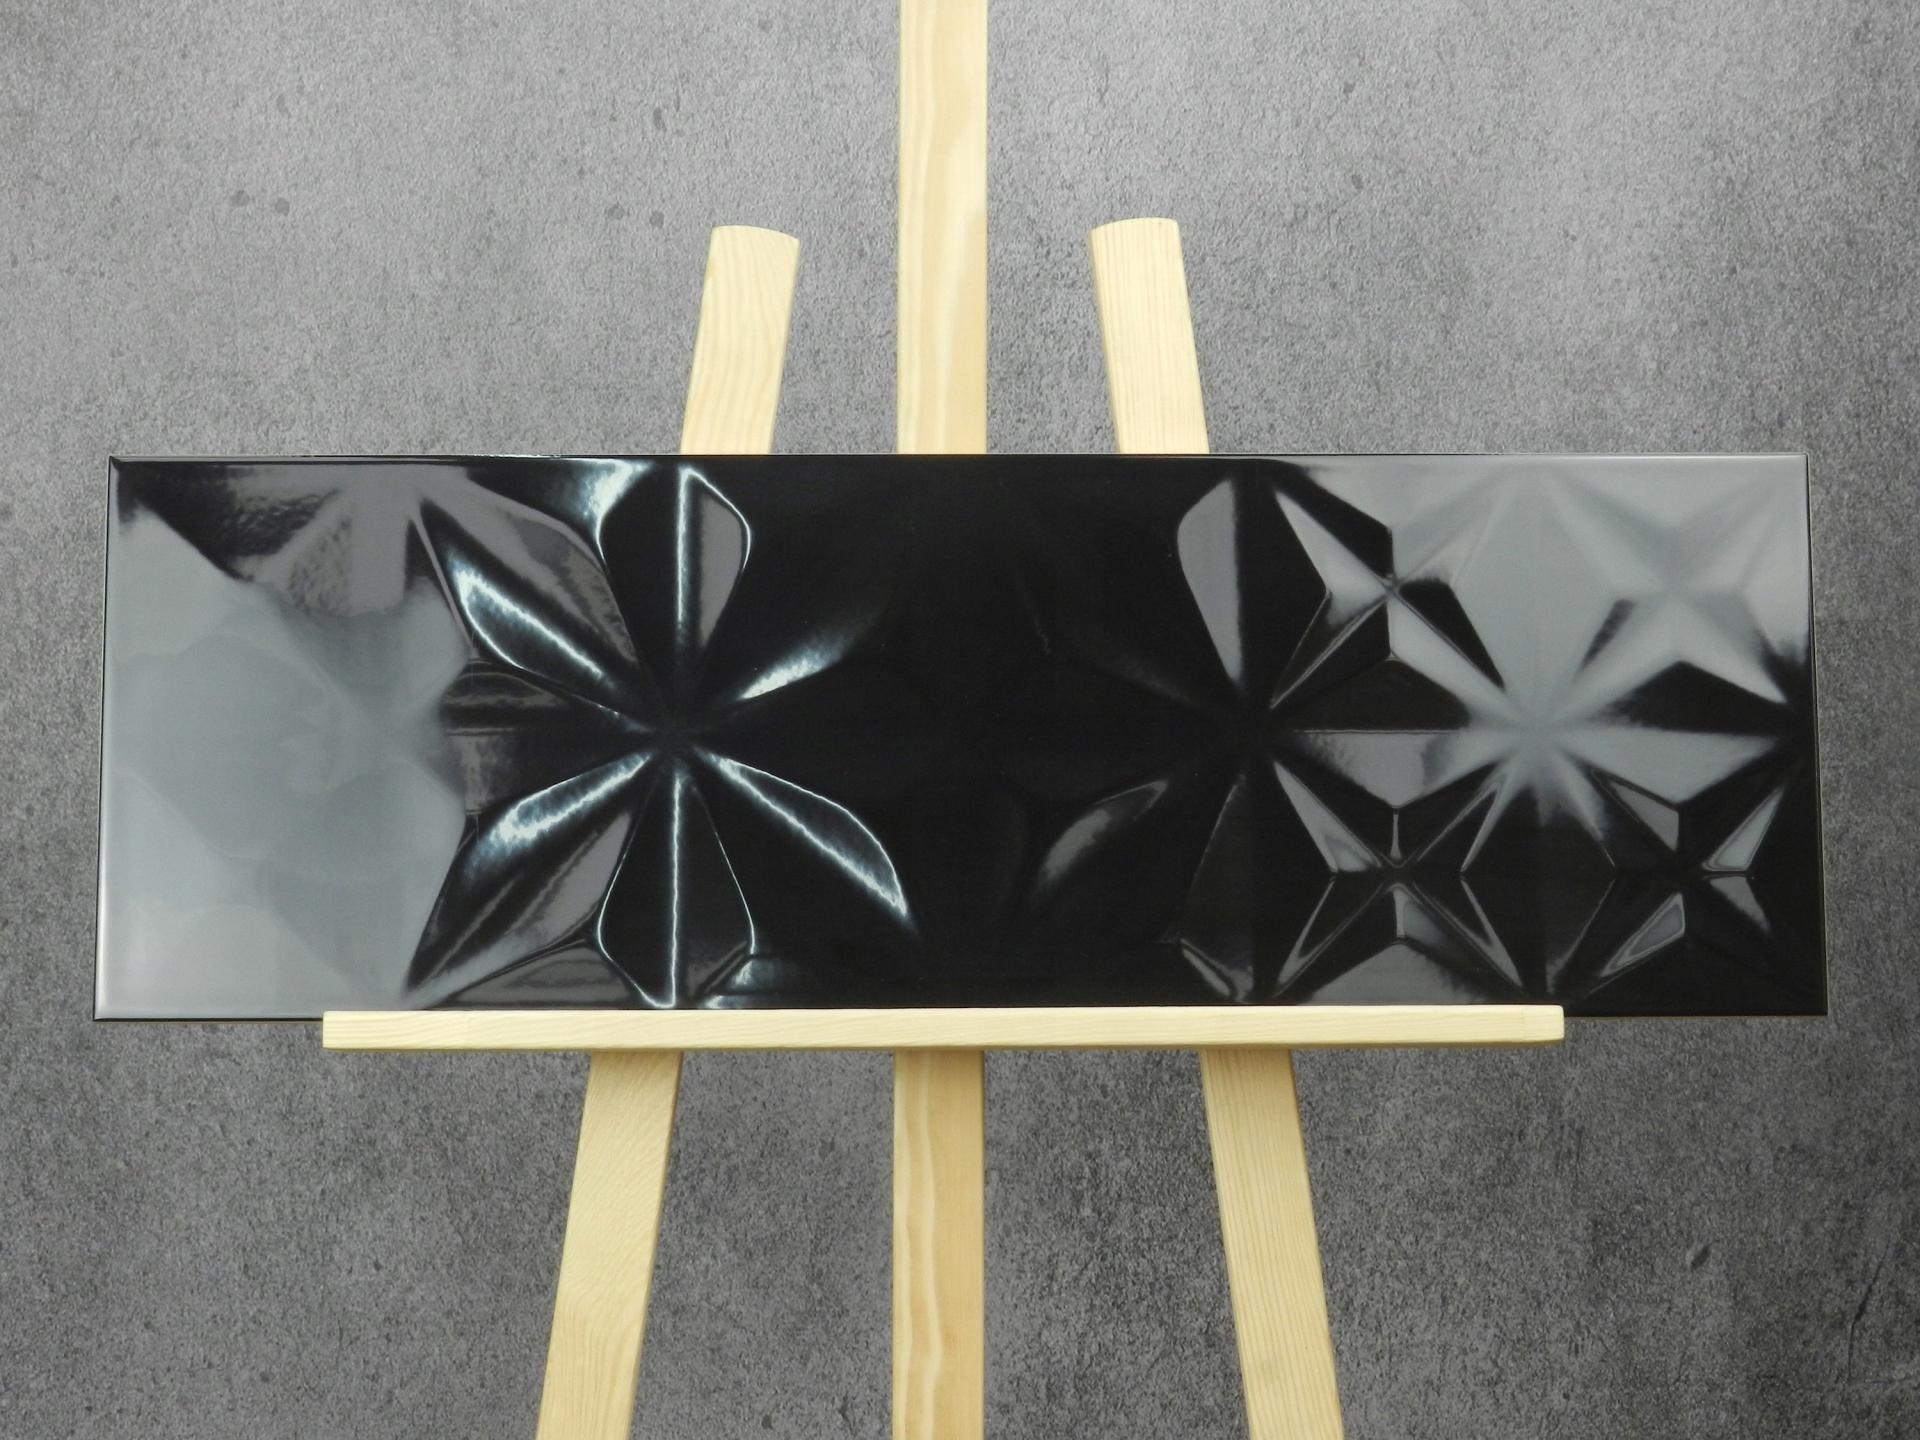 Eleganza Black Squares 25x75 Gatii Opoczno 7632574911